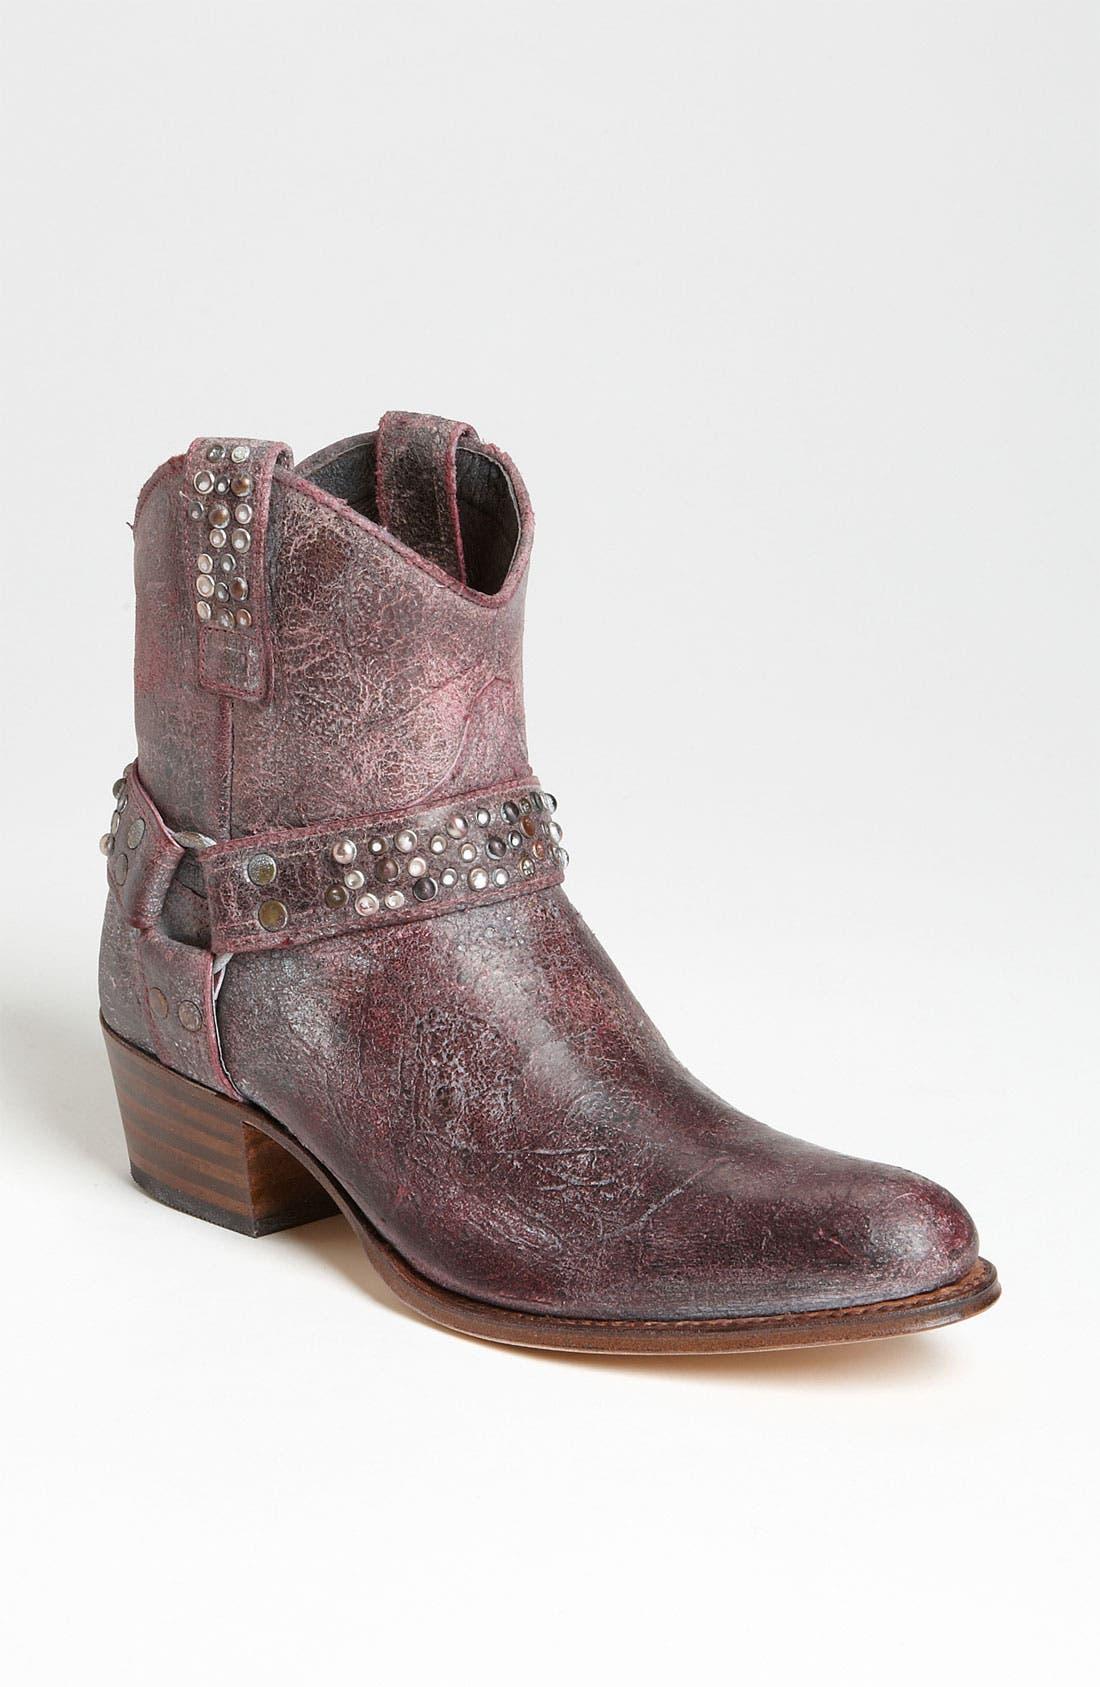 Alternate Image 1 Selected - Frye 'Deborah' Boot